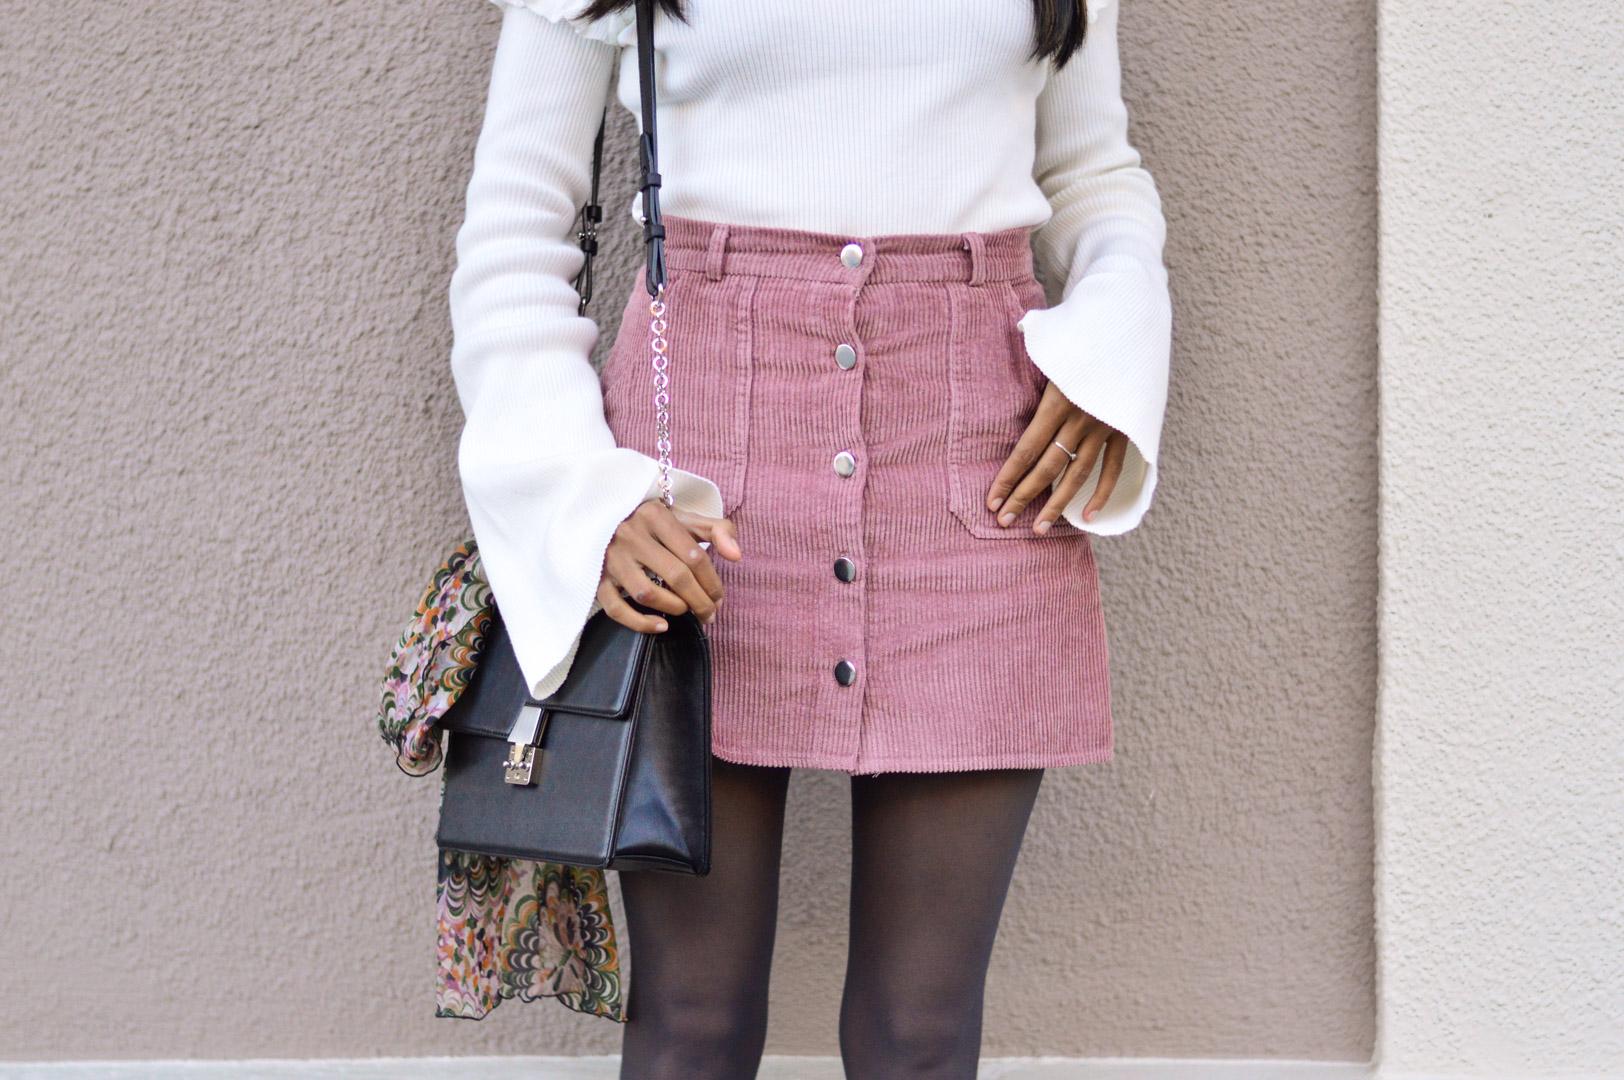 corduroy-skirt-pink-bell-sleeves-sweater-blogger 4